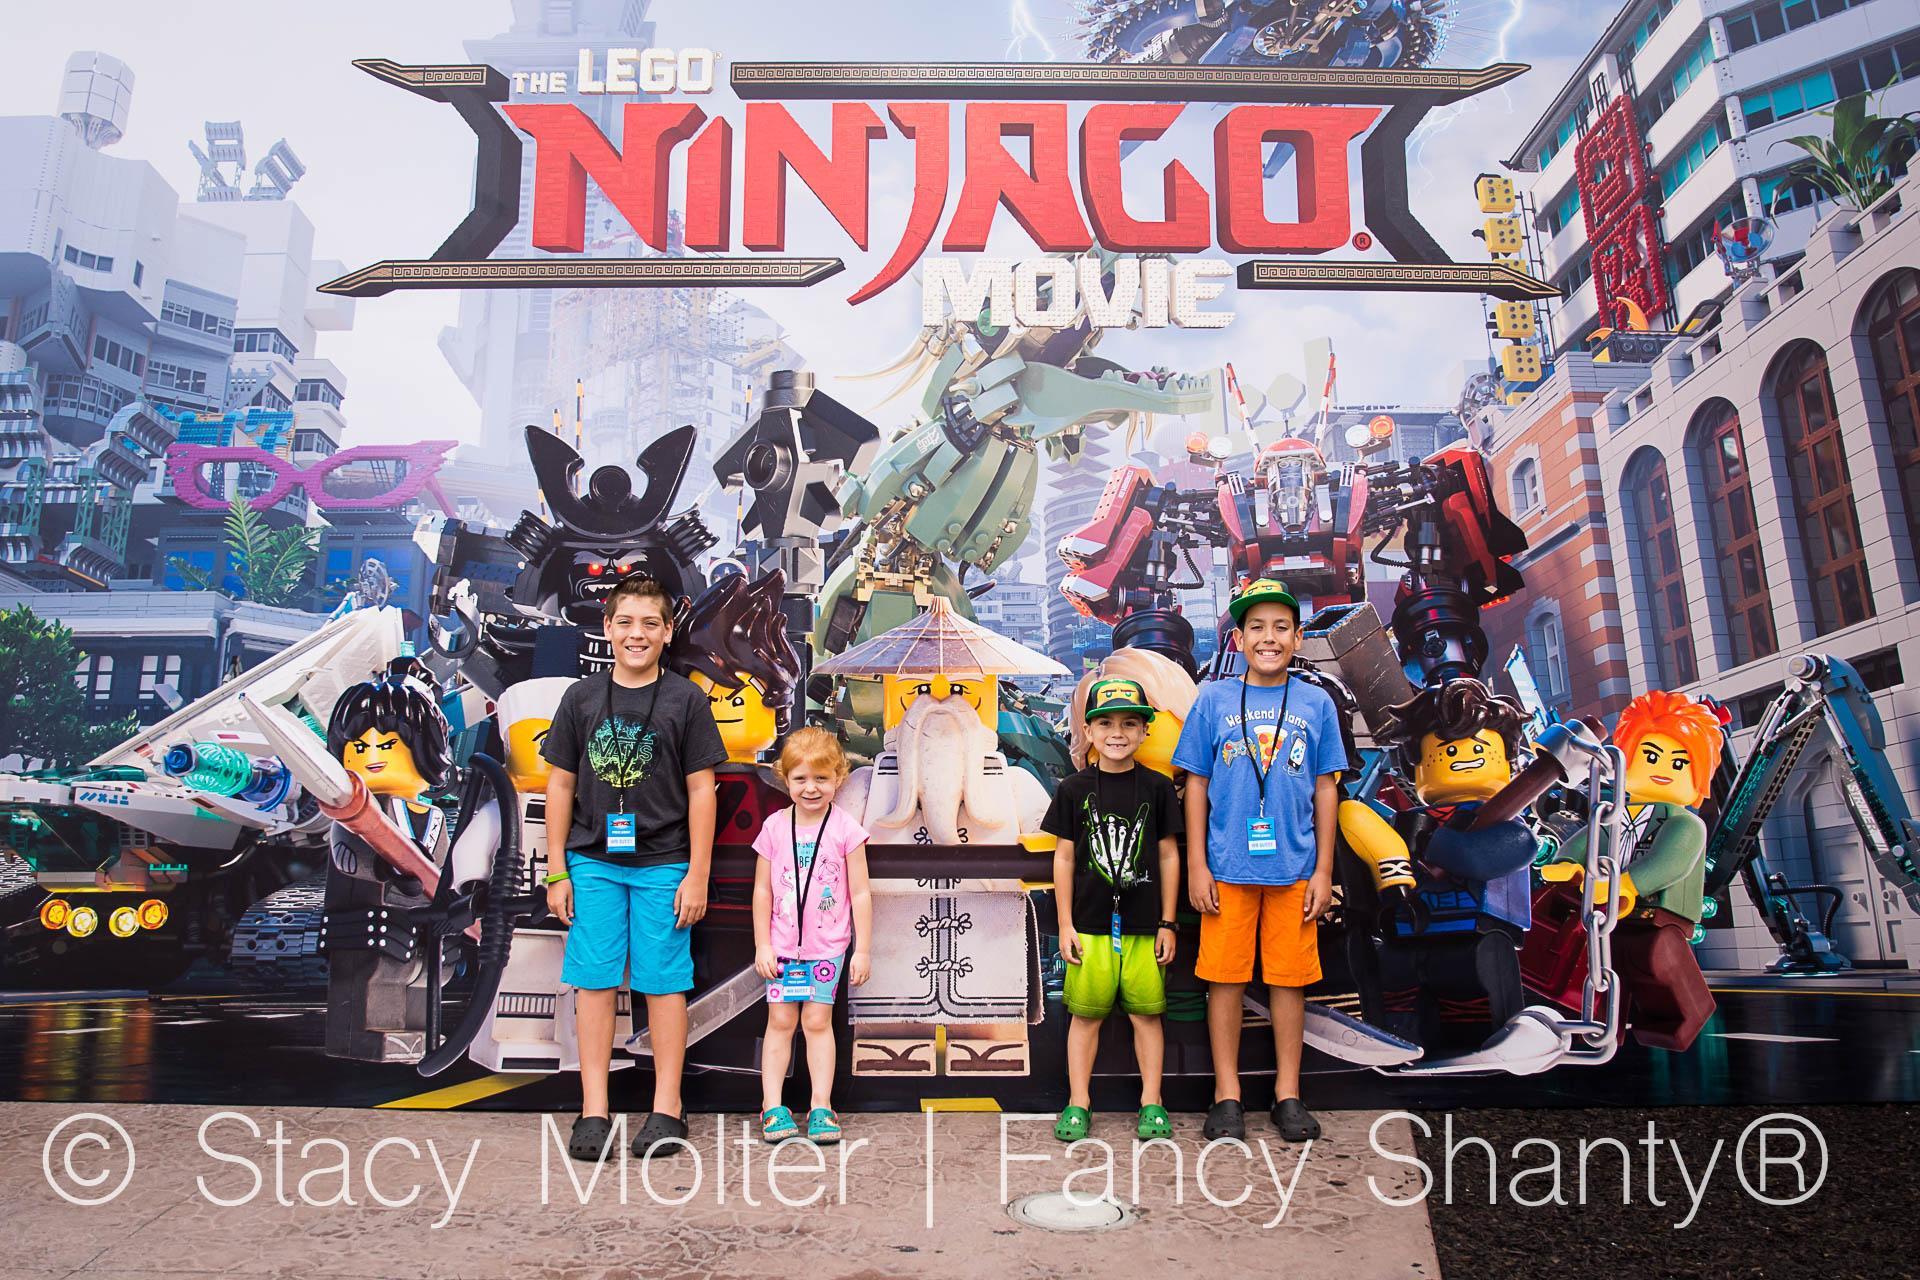 The Lego Ninjago Movie Cast Interviews & Review